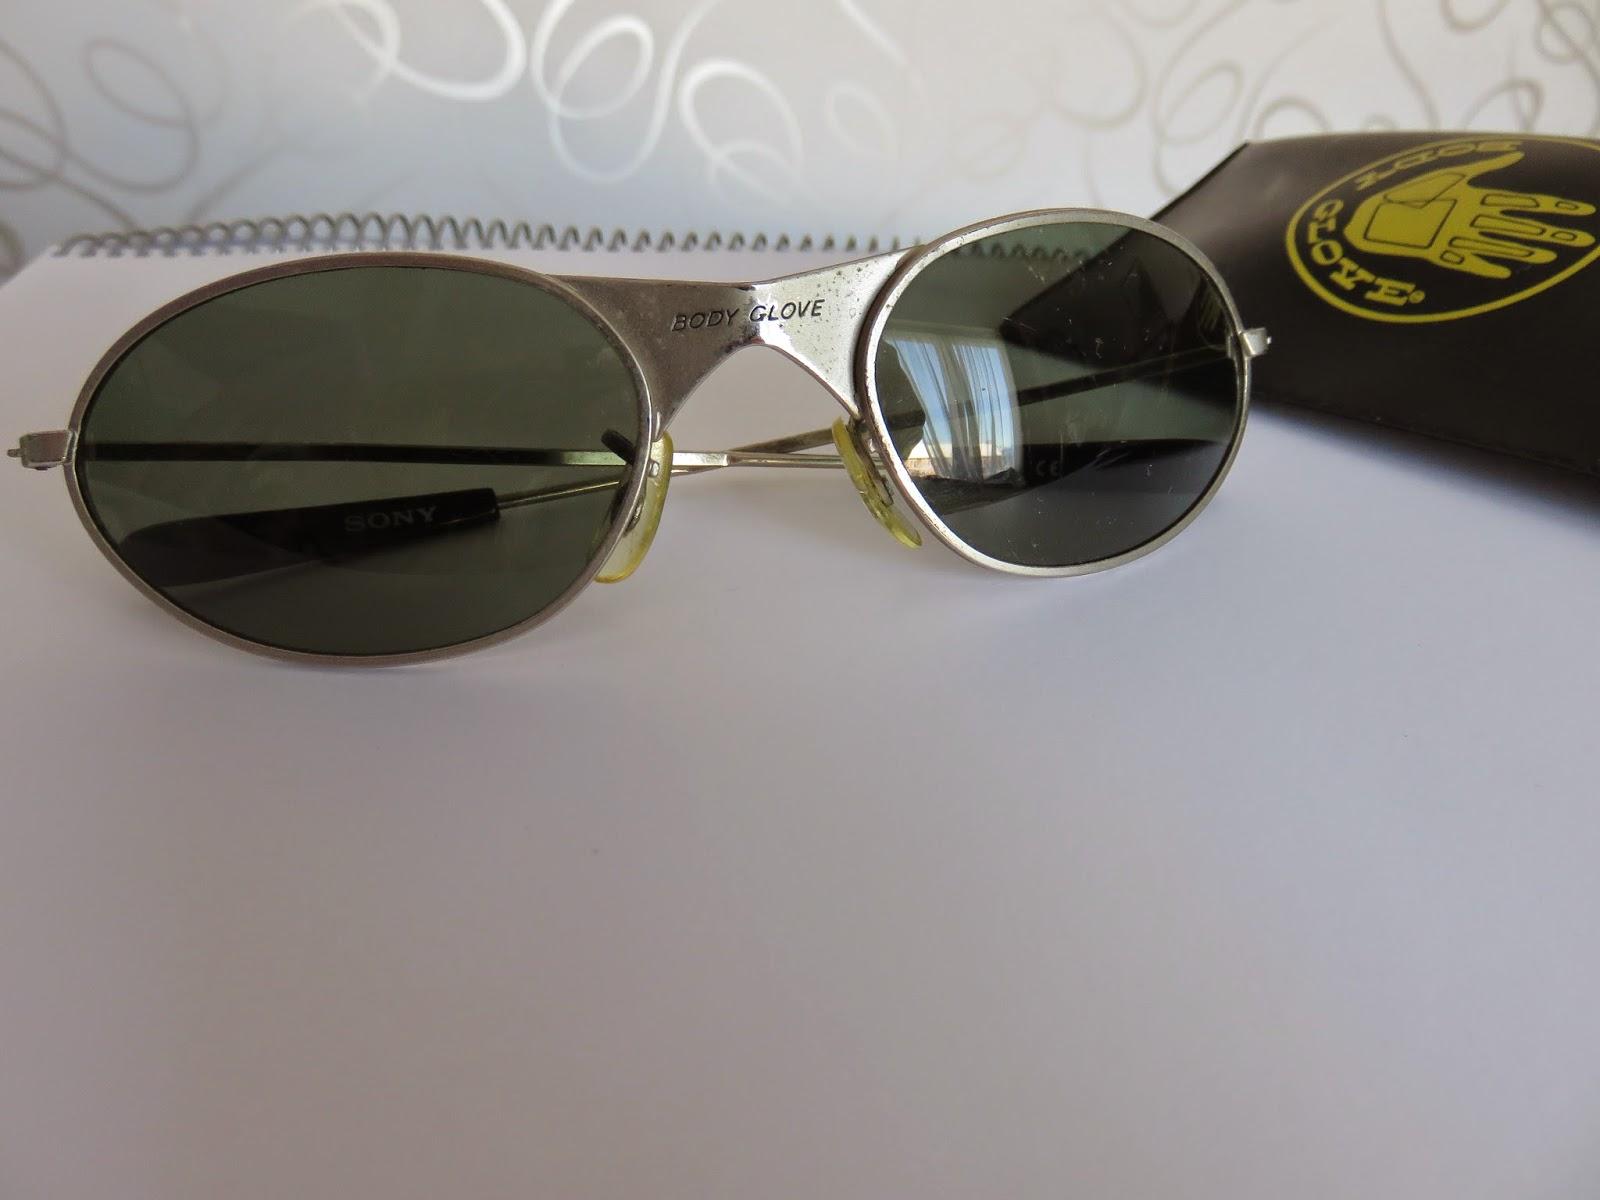 bodyglove sunglasses fashion